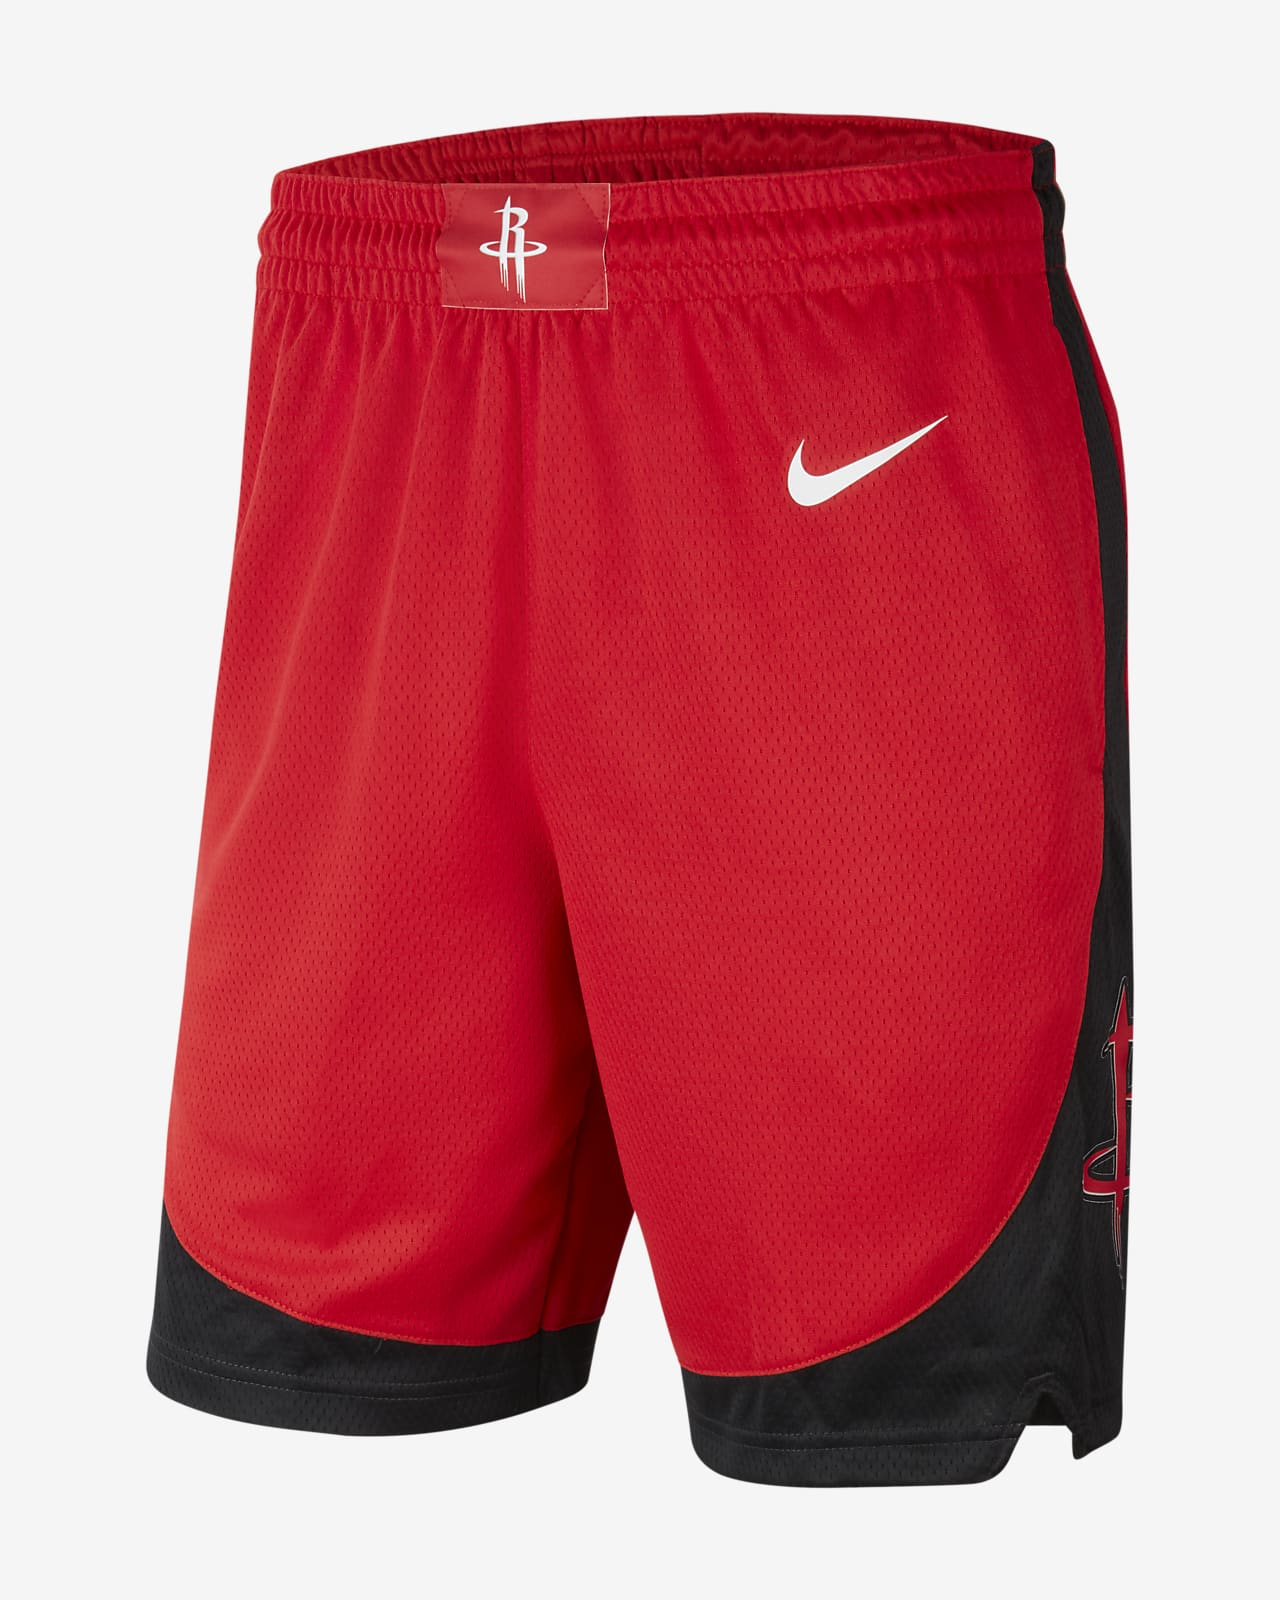 Houston Rockets Icon Edition Swingman Nike NBA-Shorts für Herren